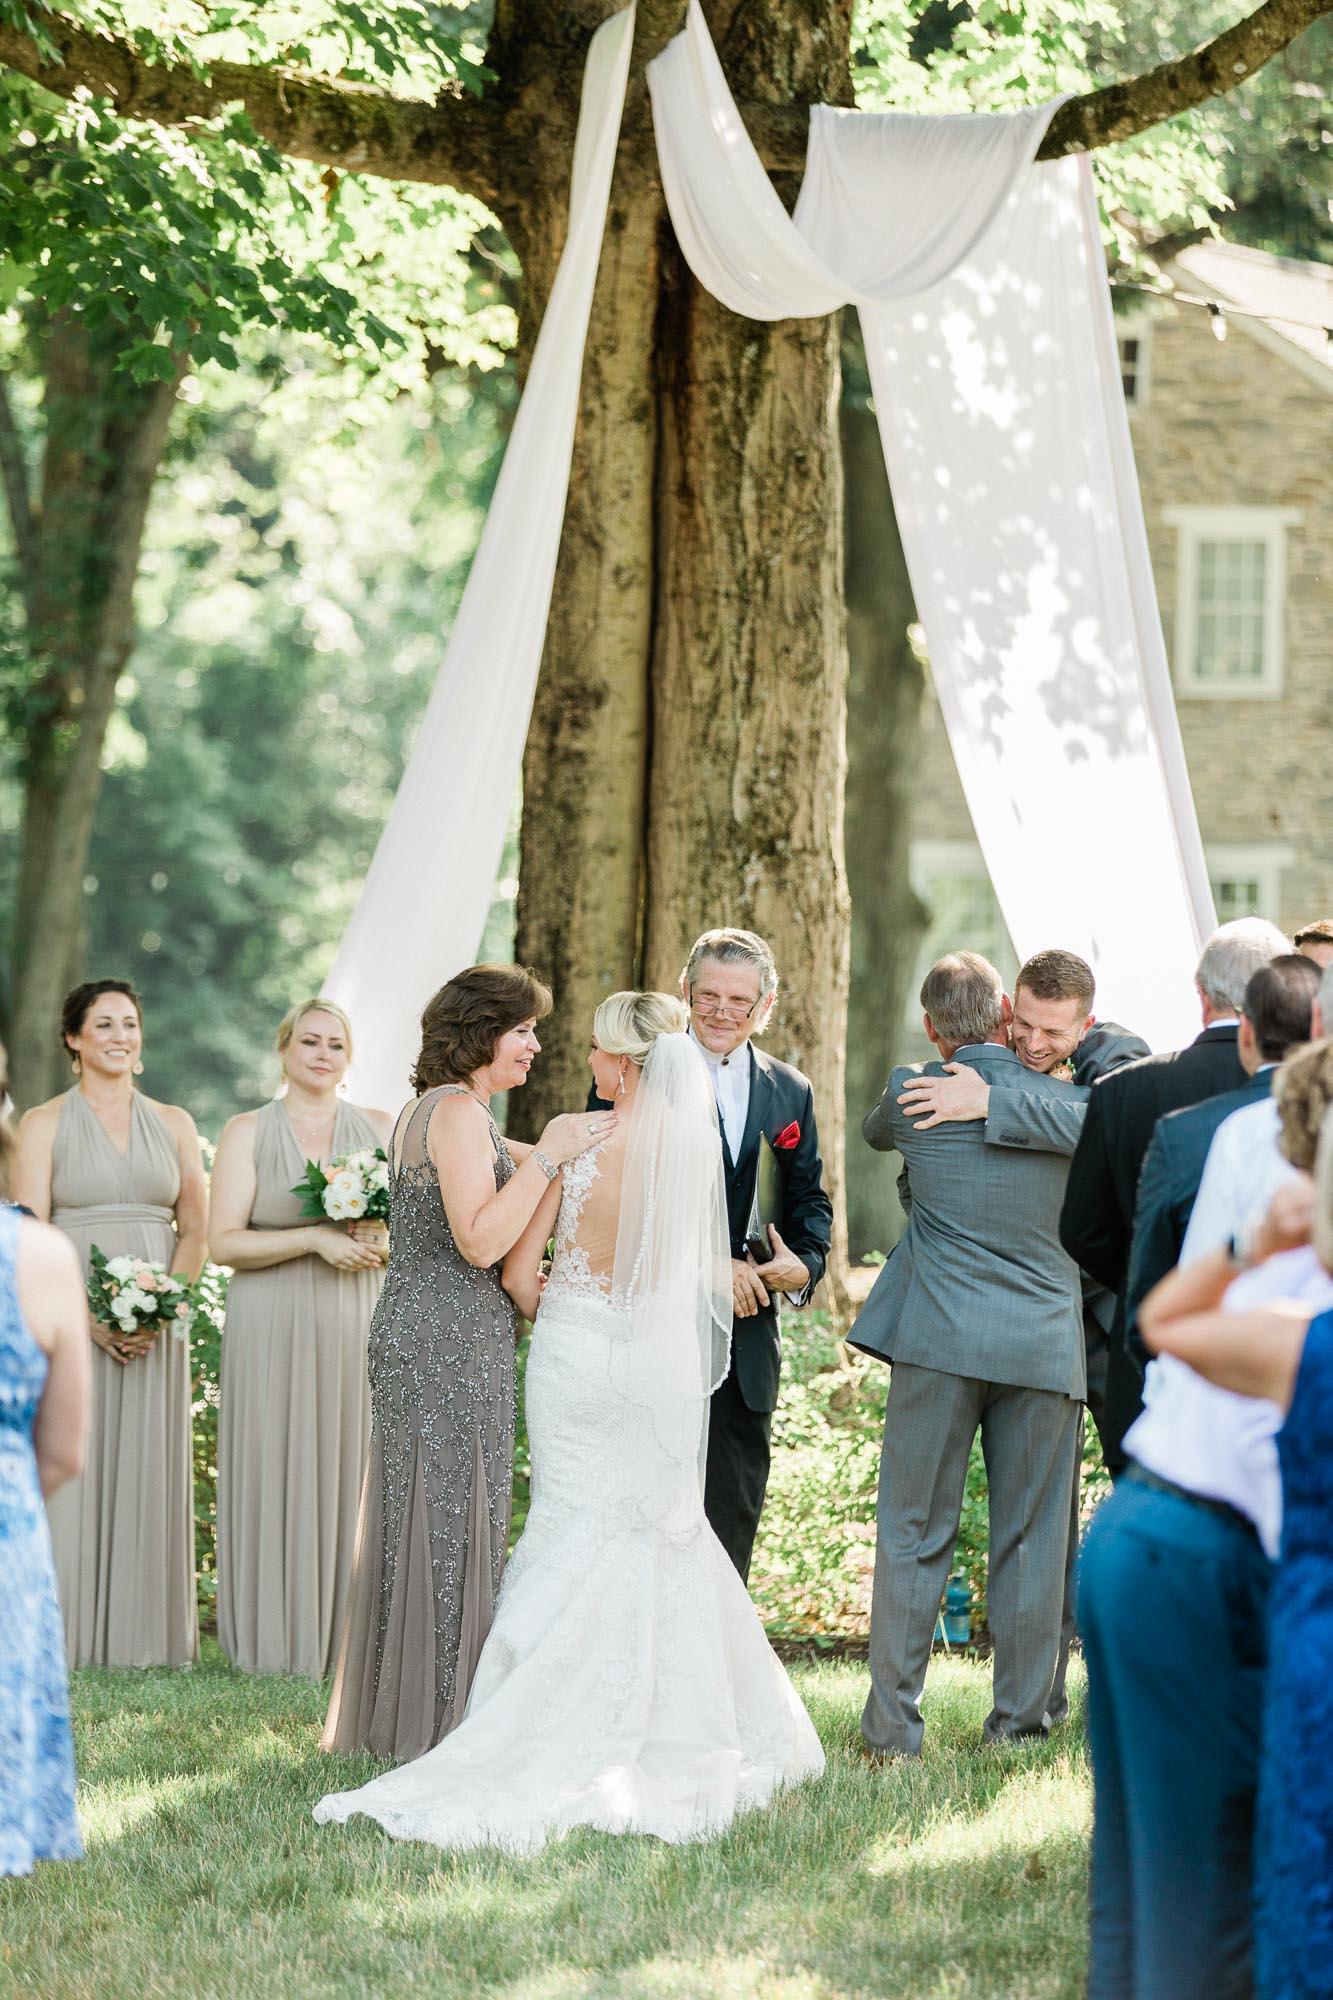 Allenberry-resort-historic-pennsylvania-wedding-21920.jpg